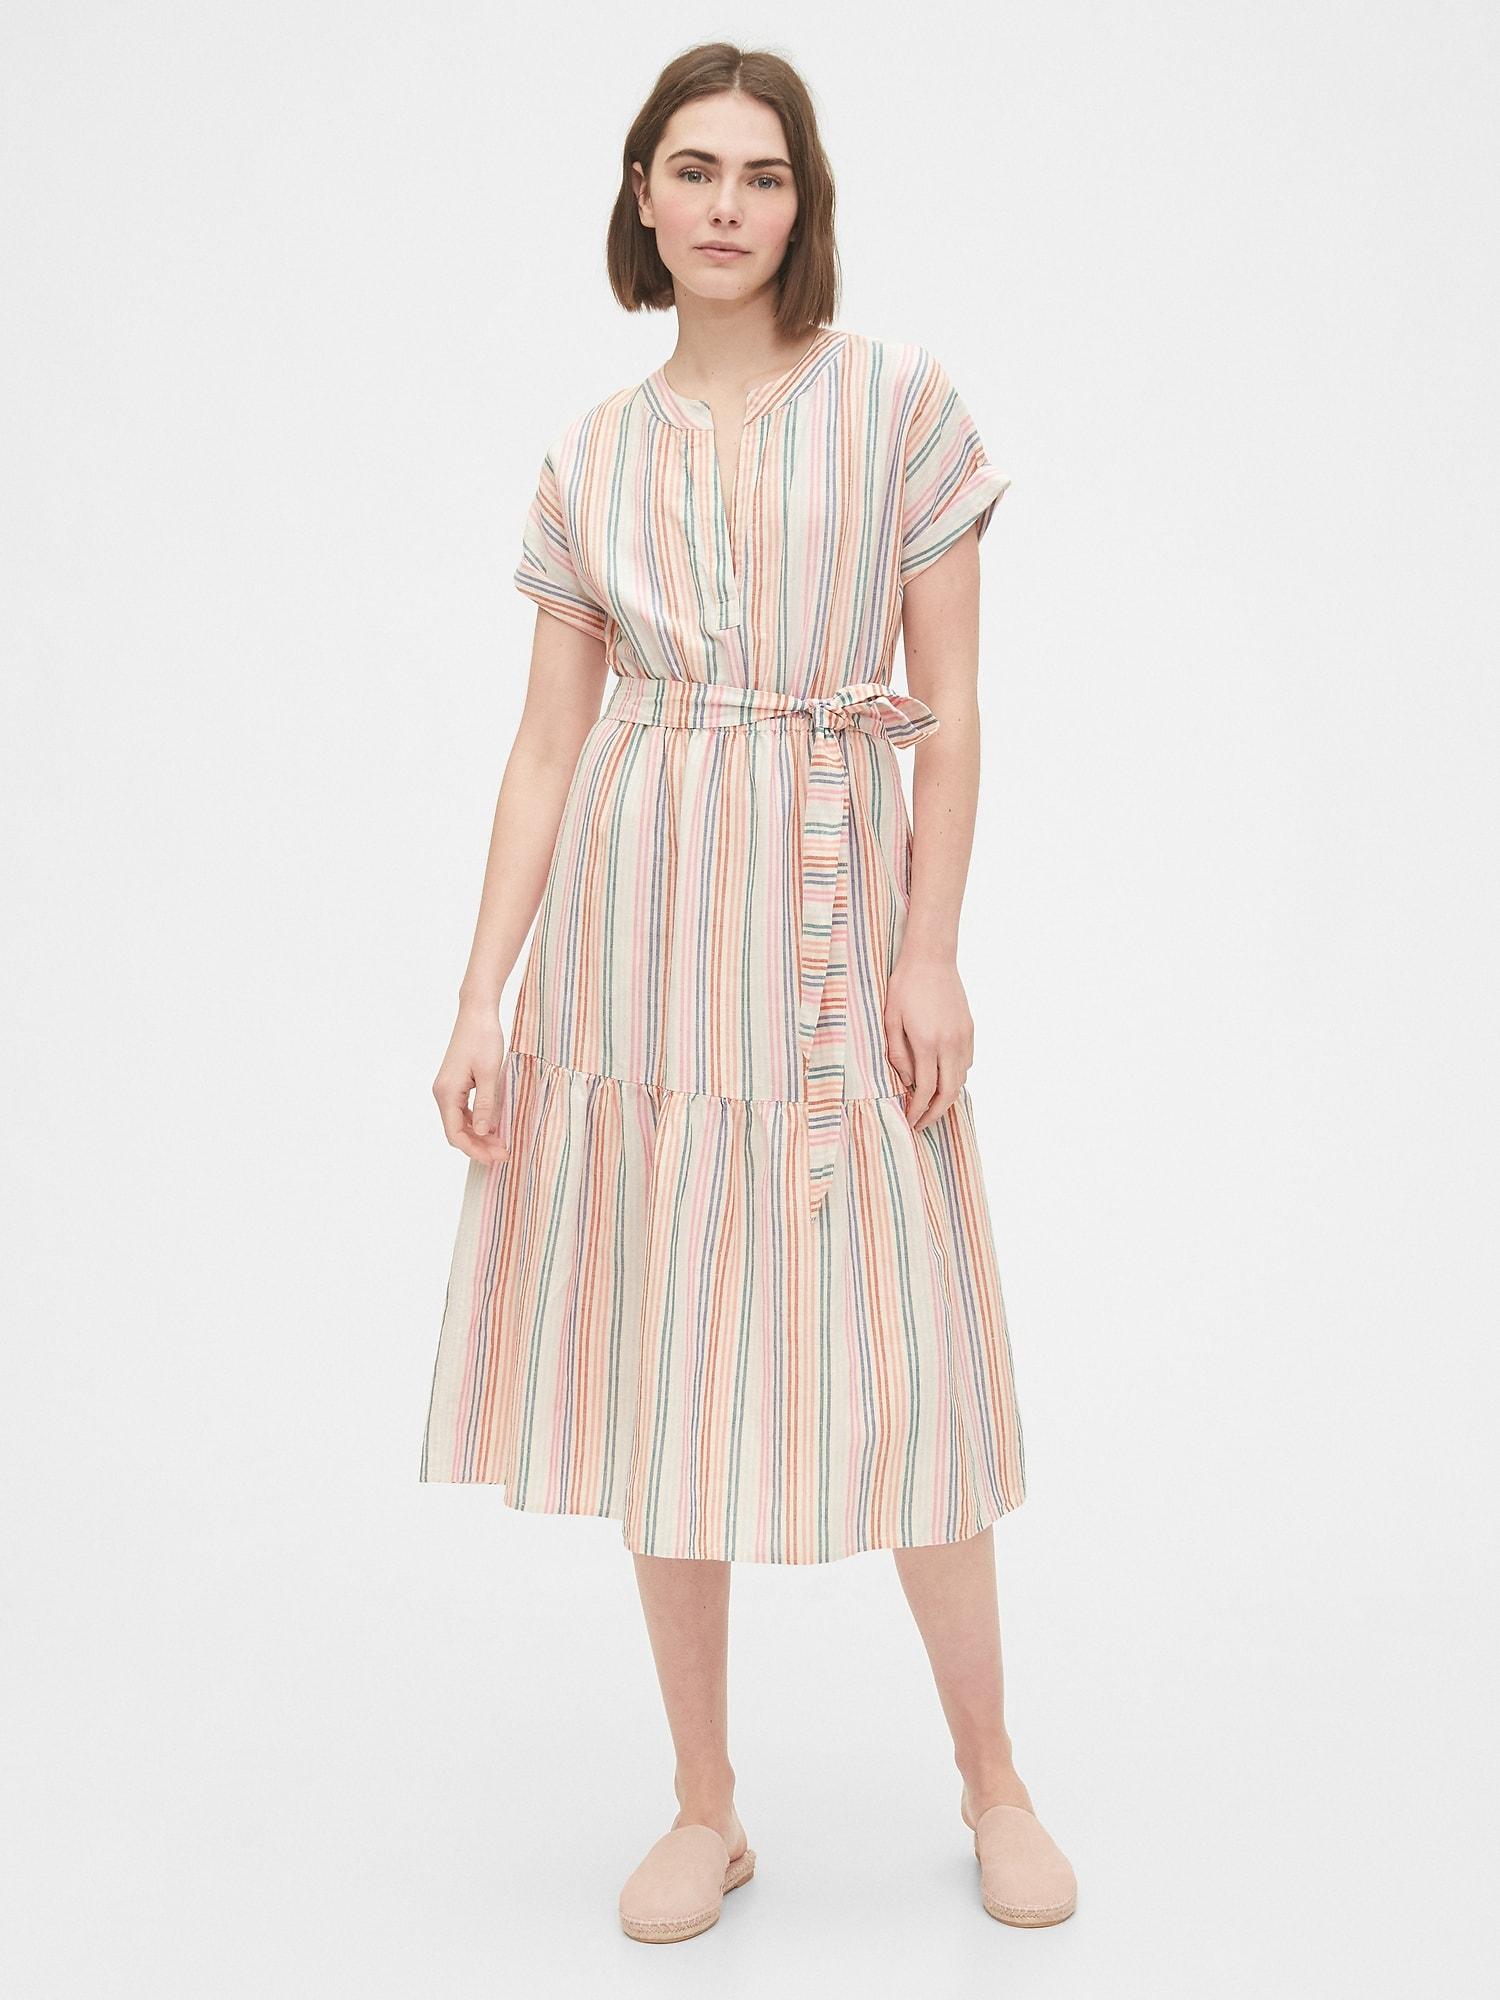 gap dress